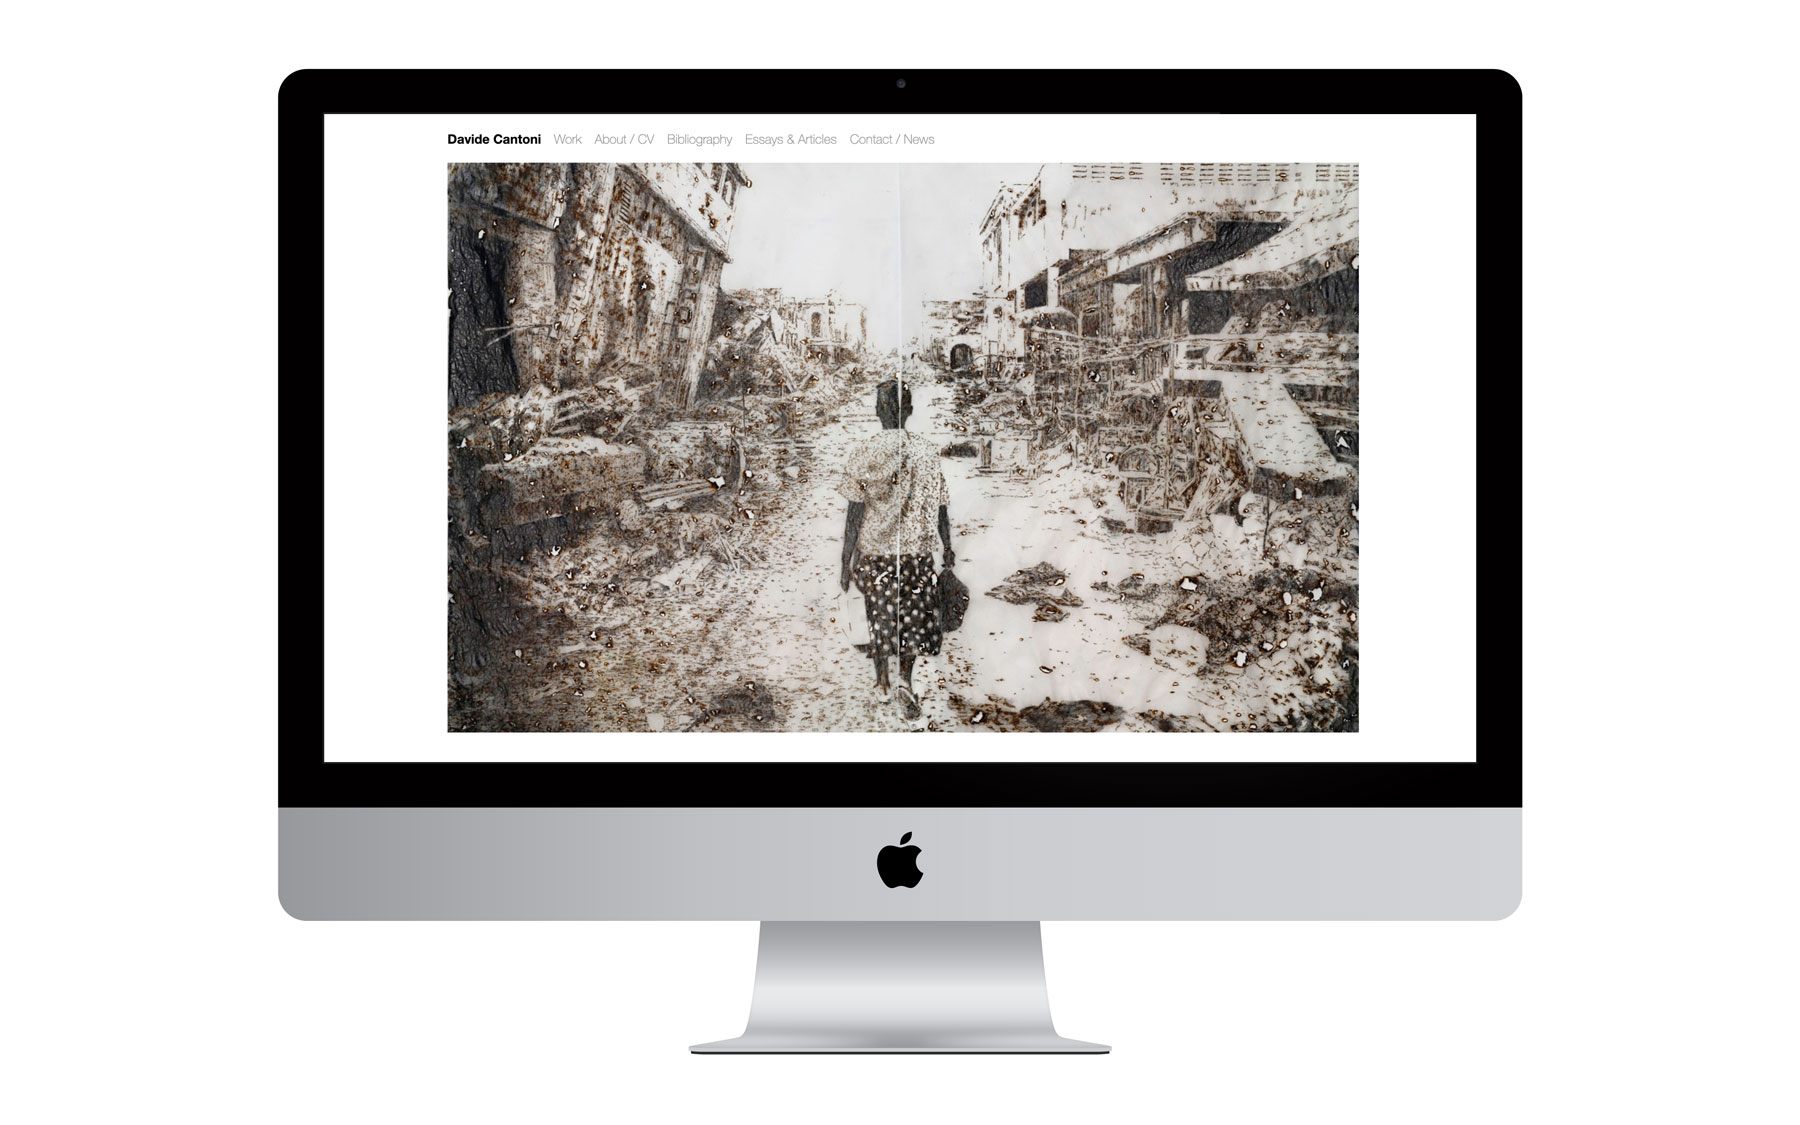 Davide Cantoni Website